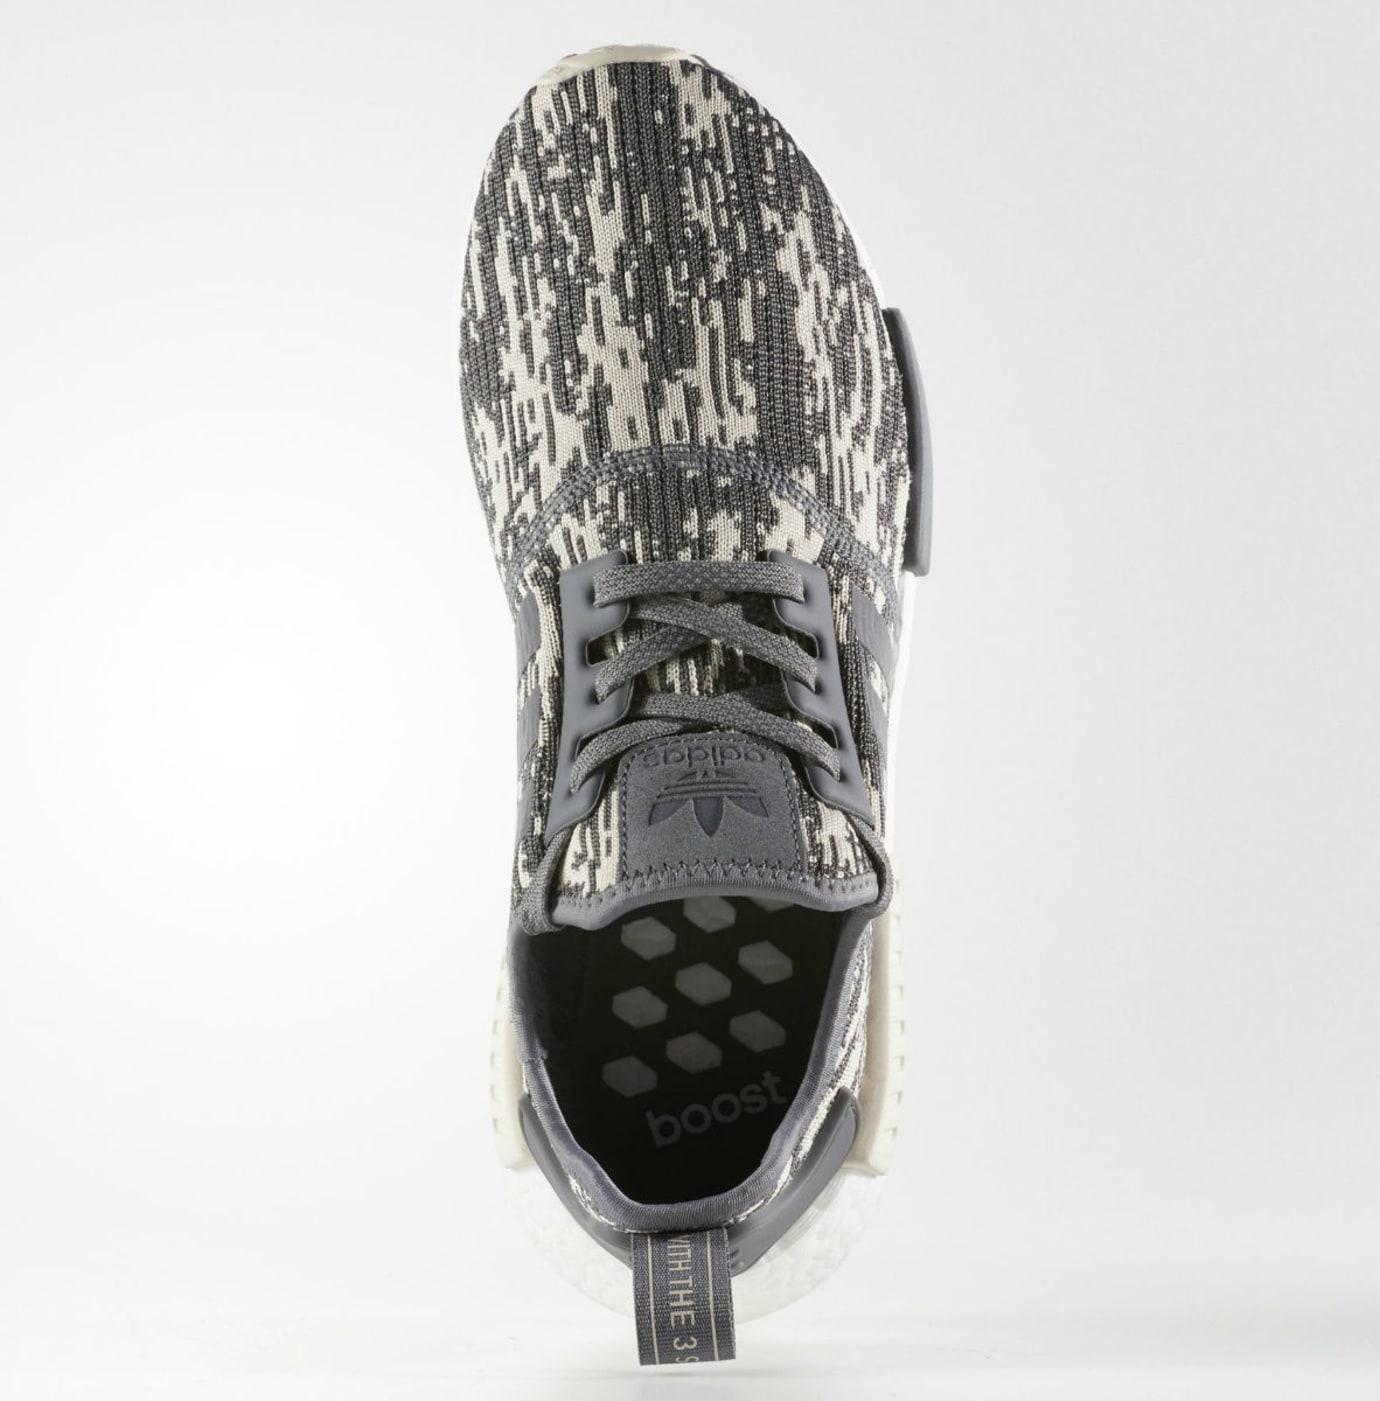 Adidas NMD Grey Linen Camo Release Date Top